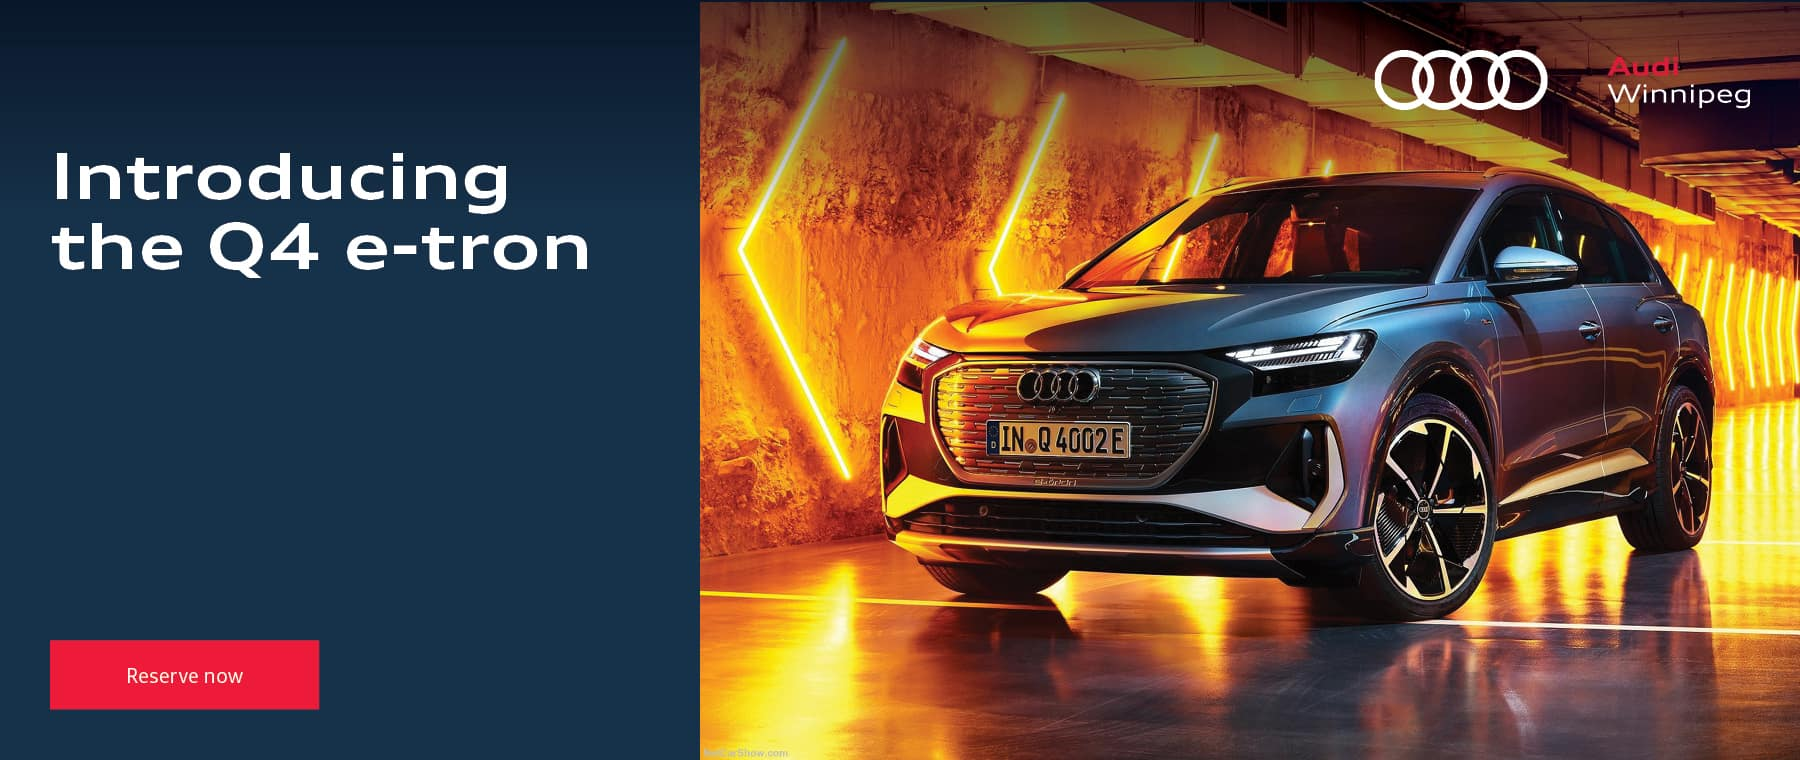 Audi-Wpg-Q4-E-tron – Web-Banner